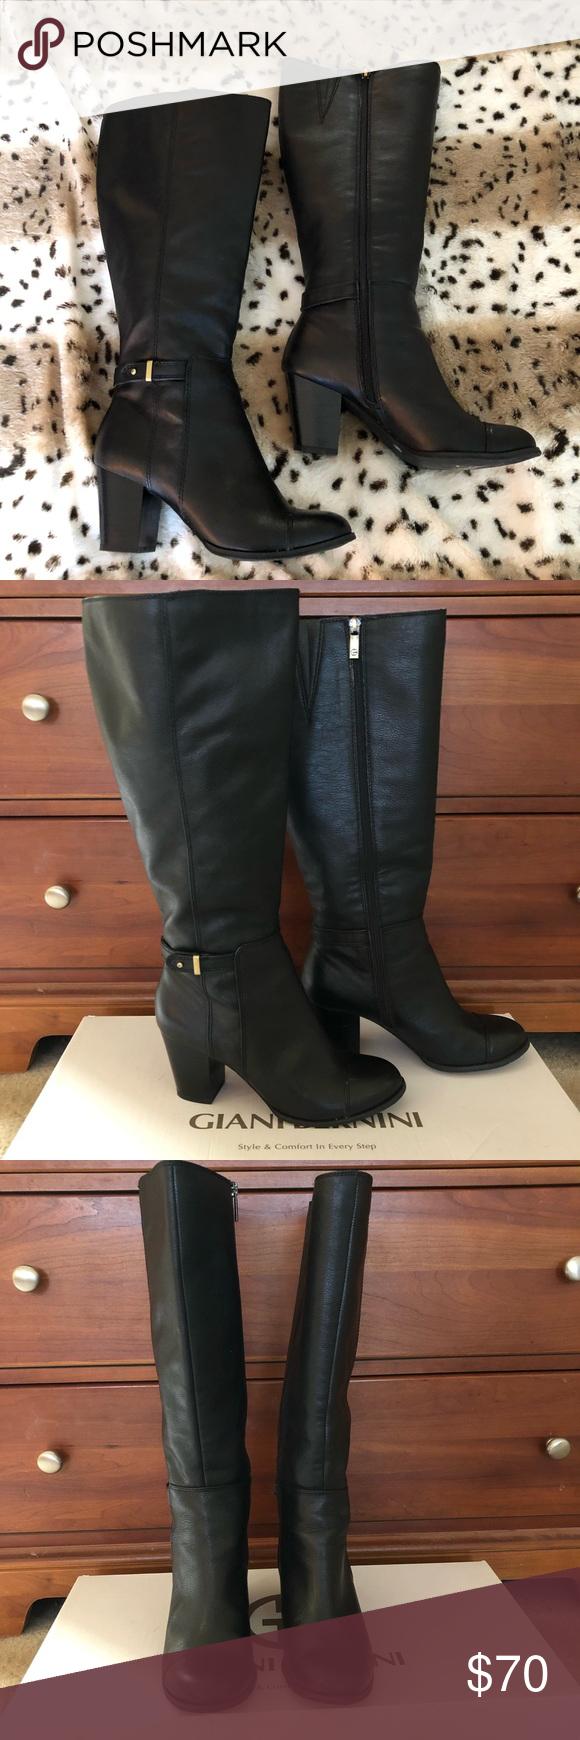 GIANI BERNINI High Heel Black Boots Sz 7.5 WC GIAN